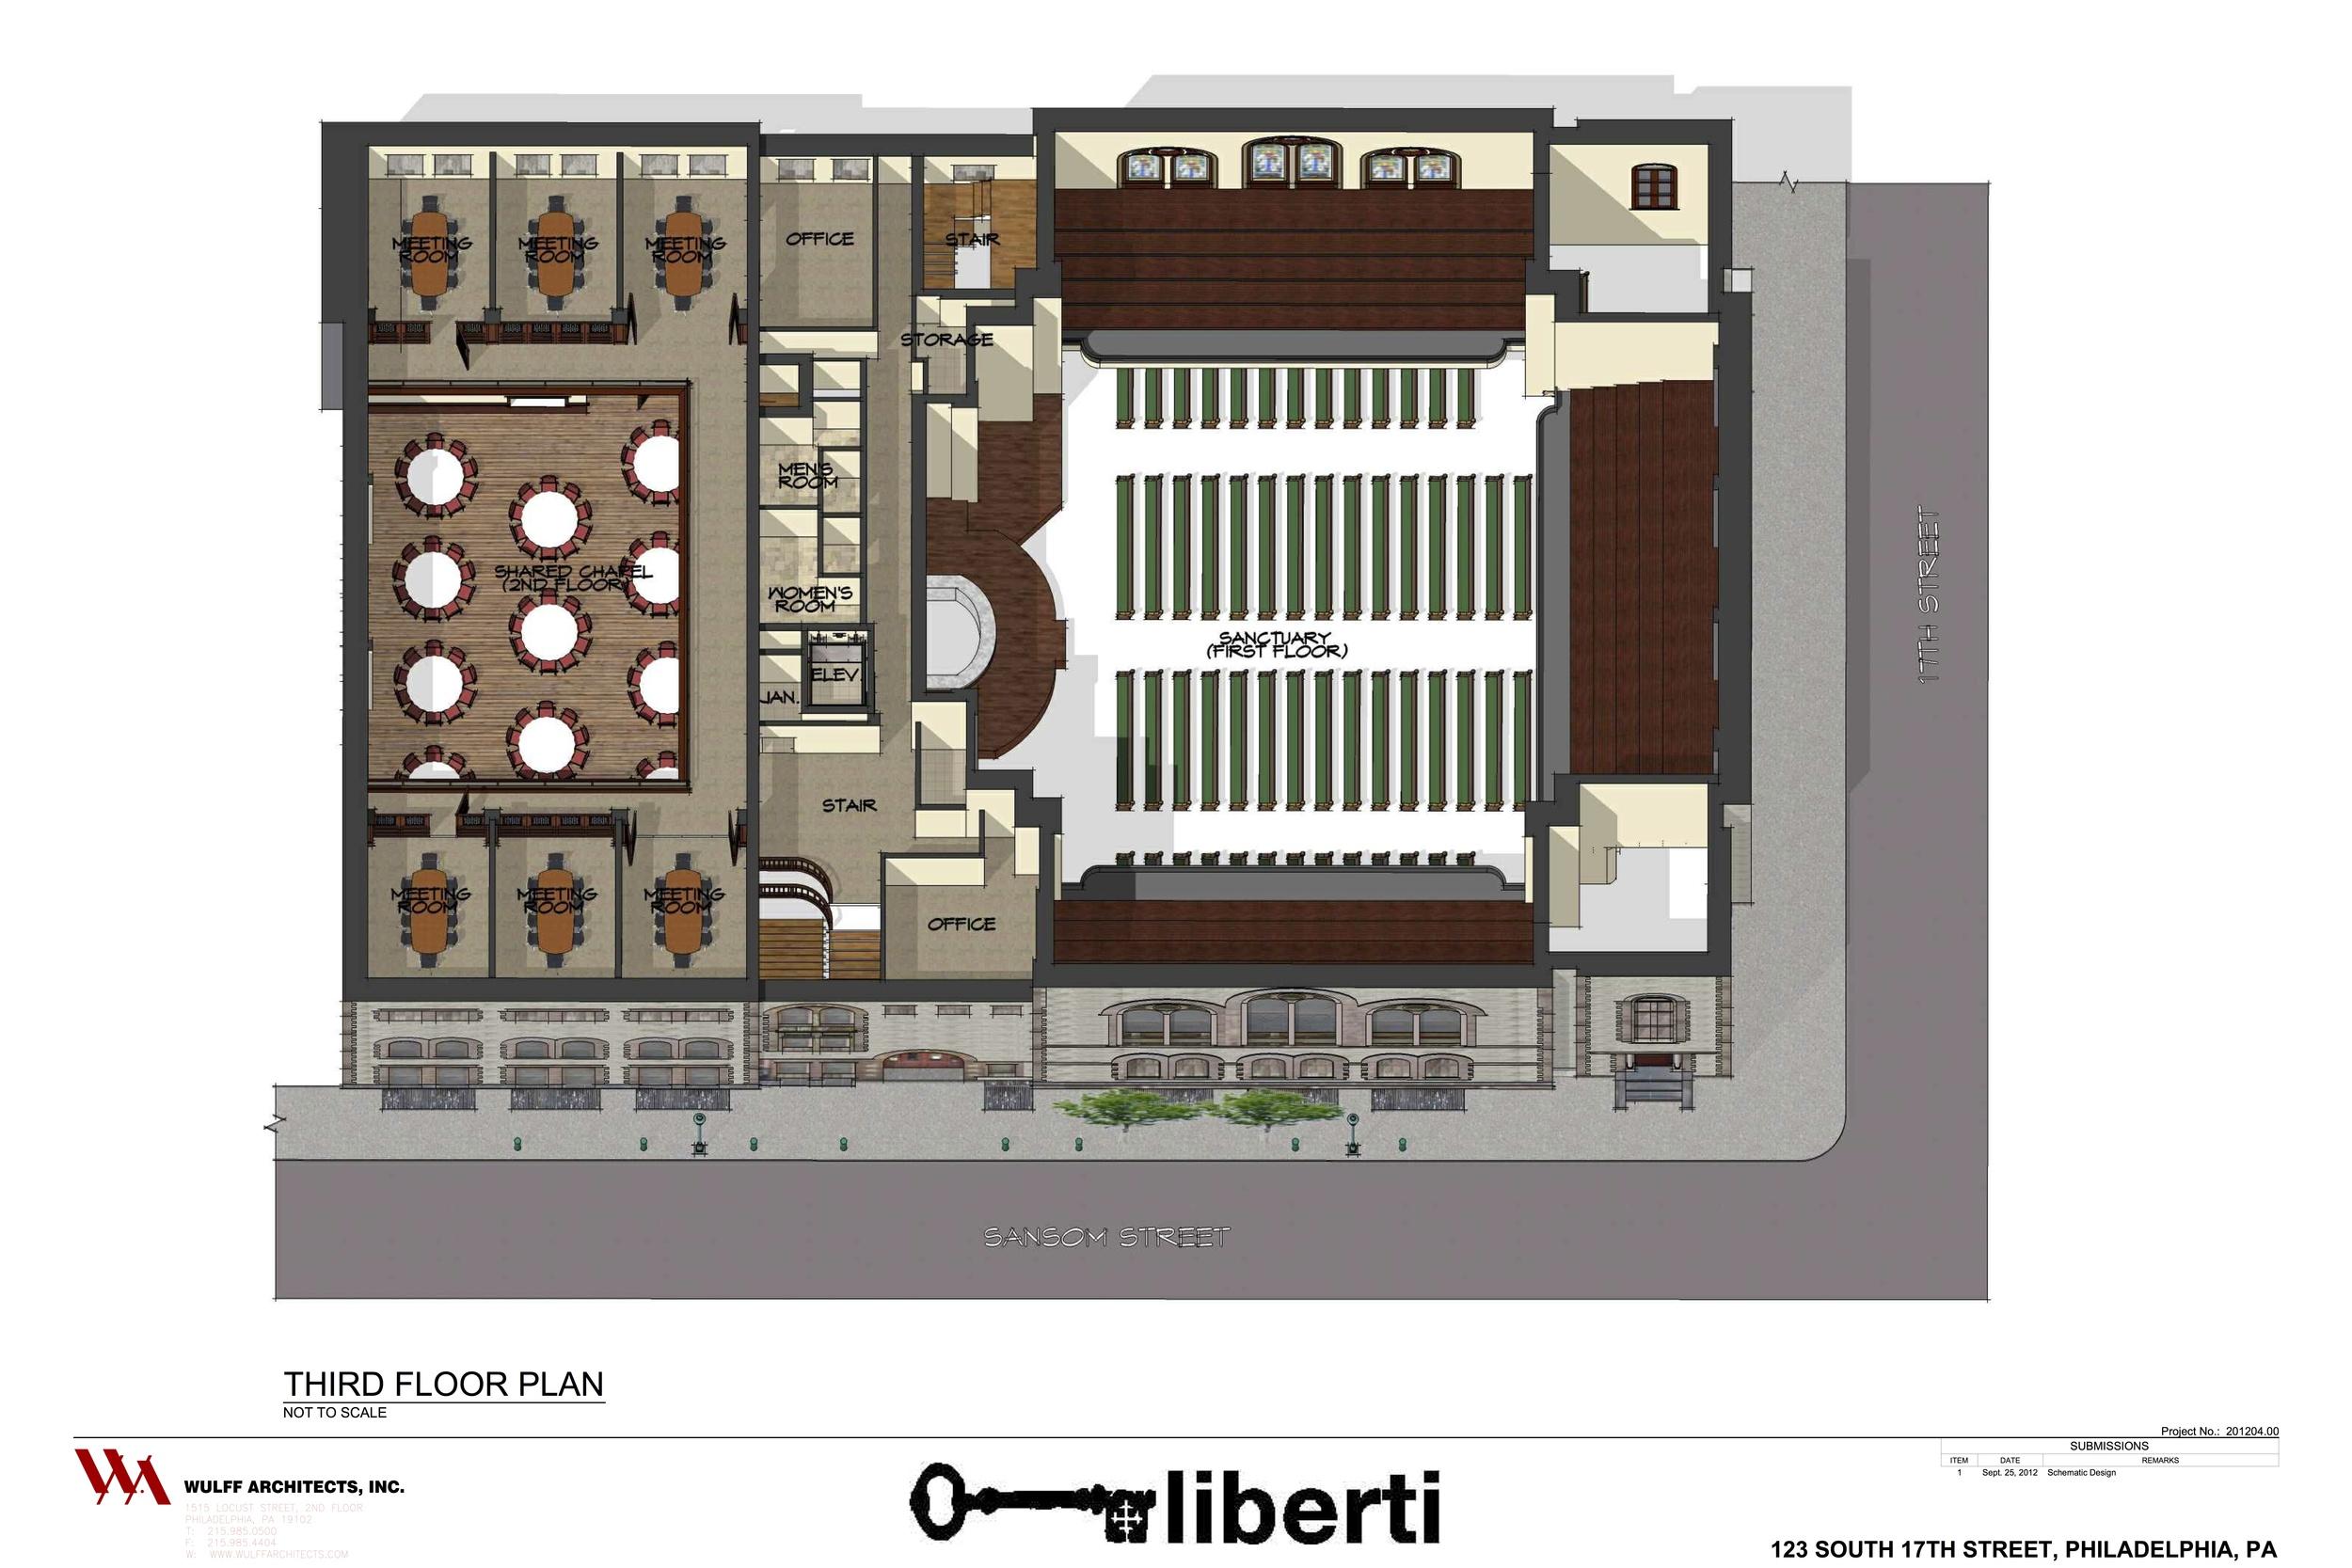 Liberti_Presentation Boards_Final, 09-25-14_03.jpg